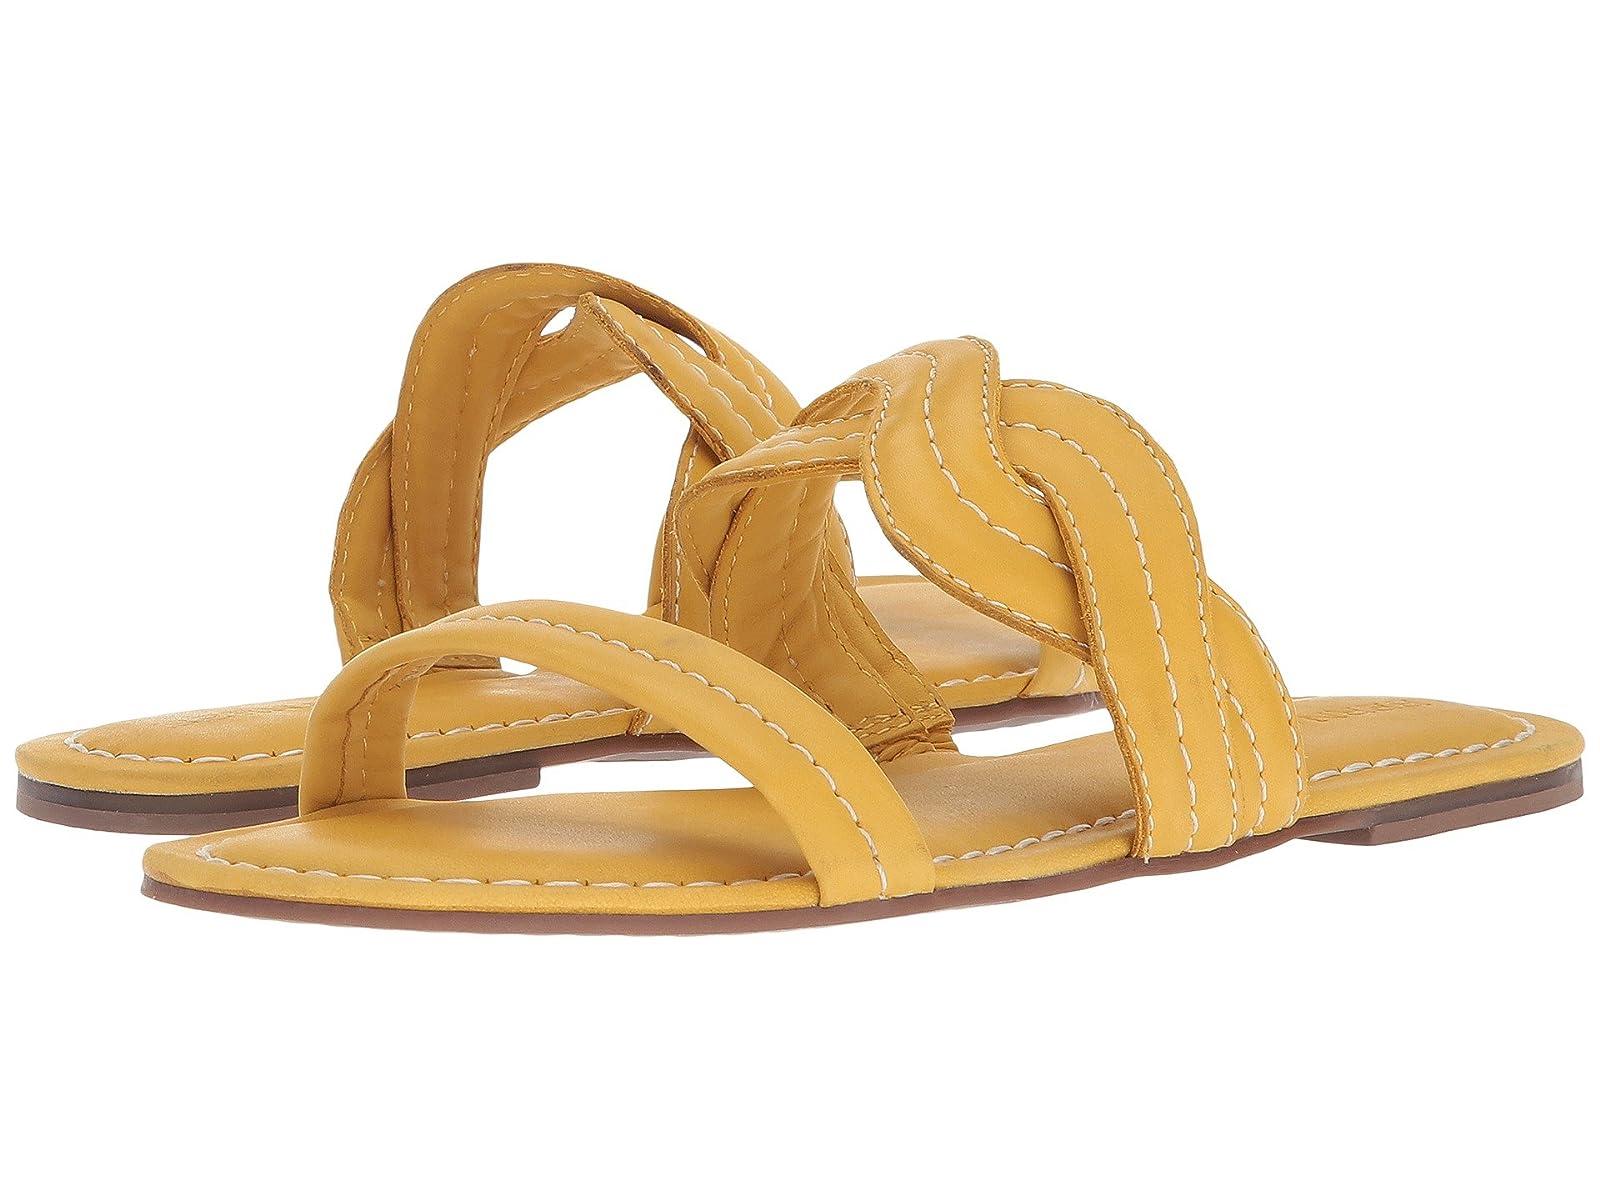 Bernardo Mirian SandalComfortable and distinctive shoes